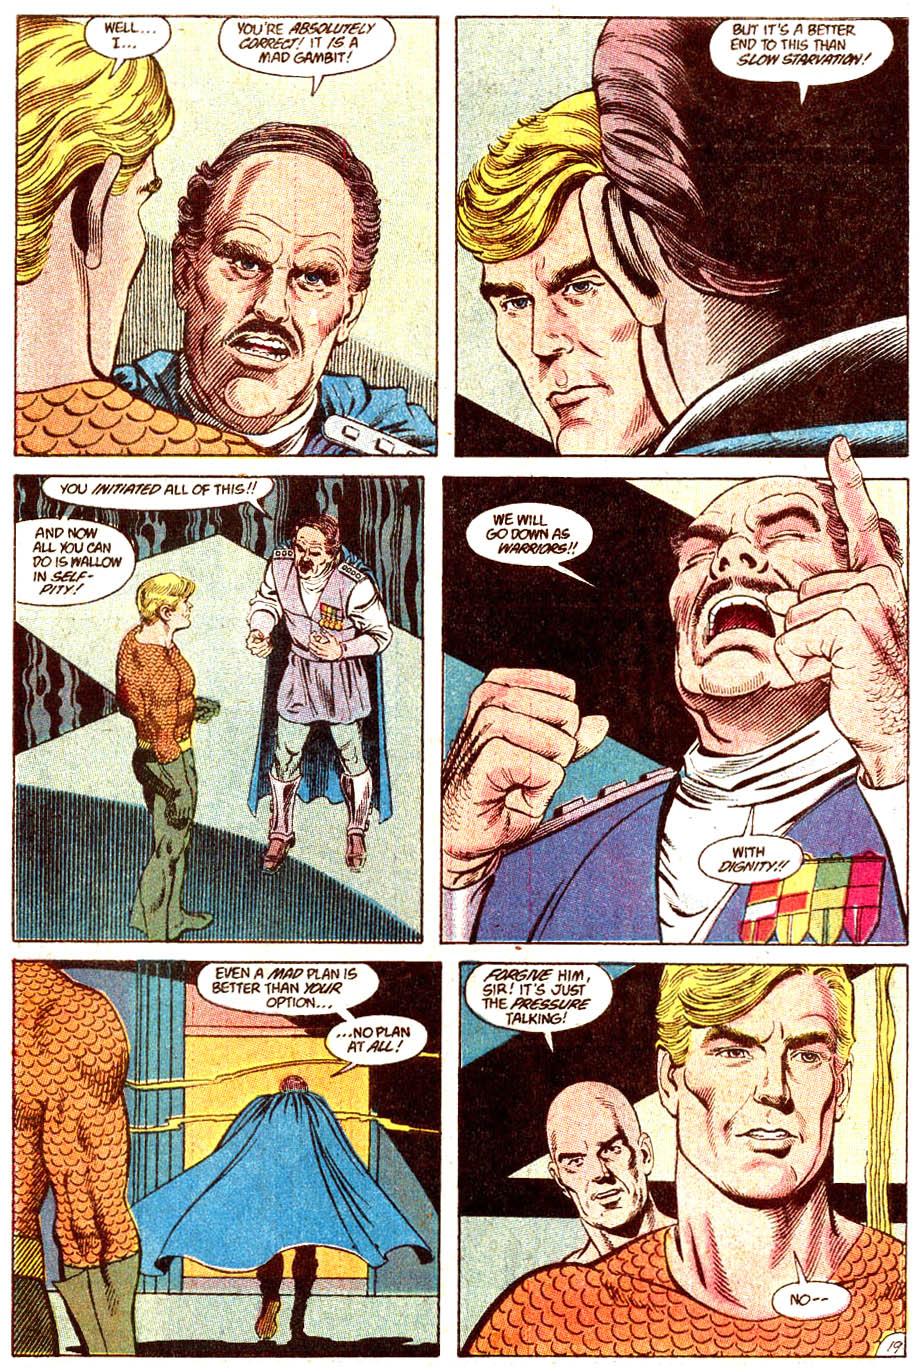 Read online Aquaman (1989) comic -  Issue #4 - 20